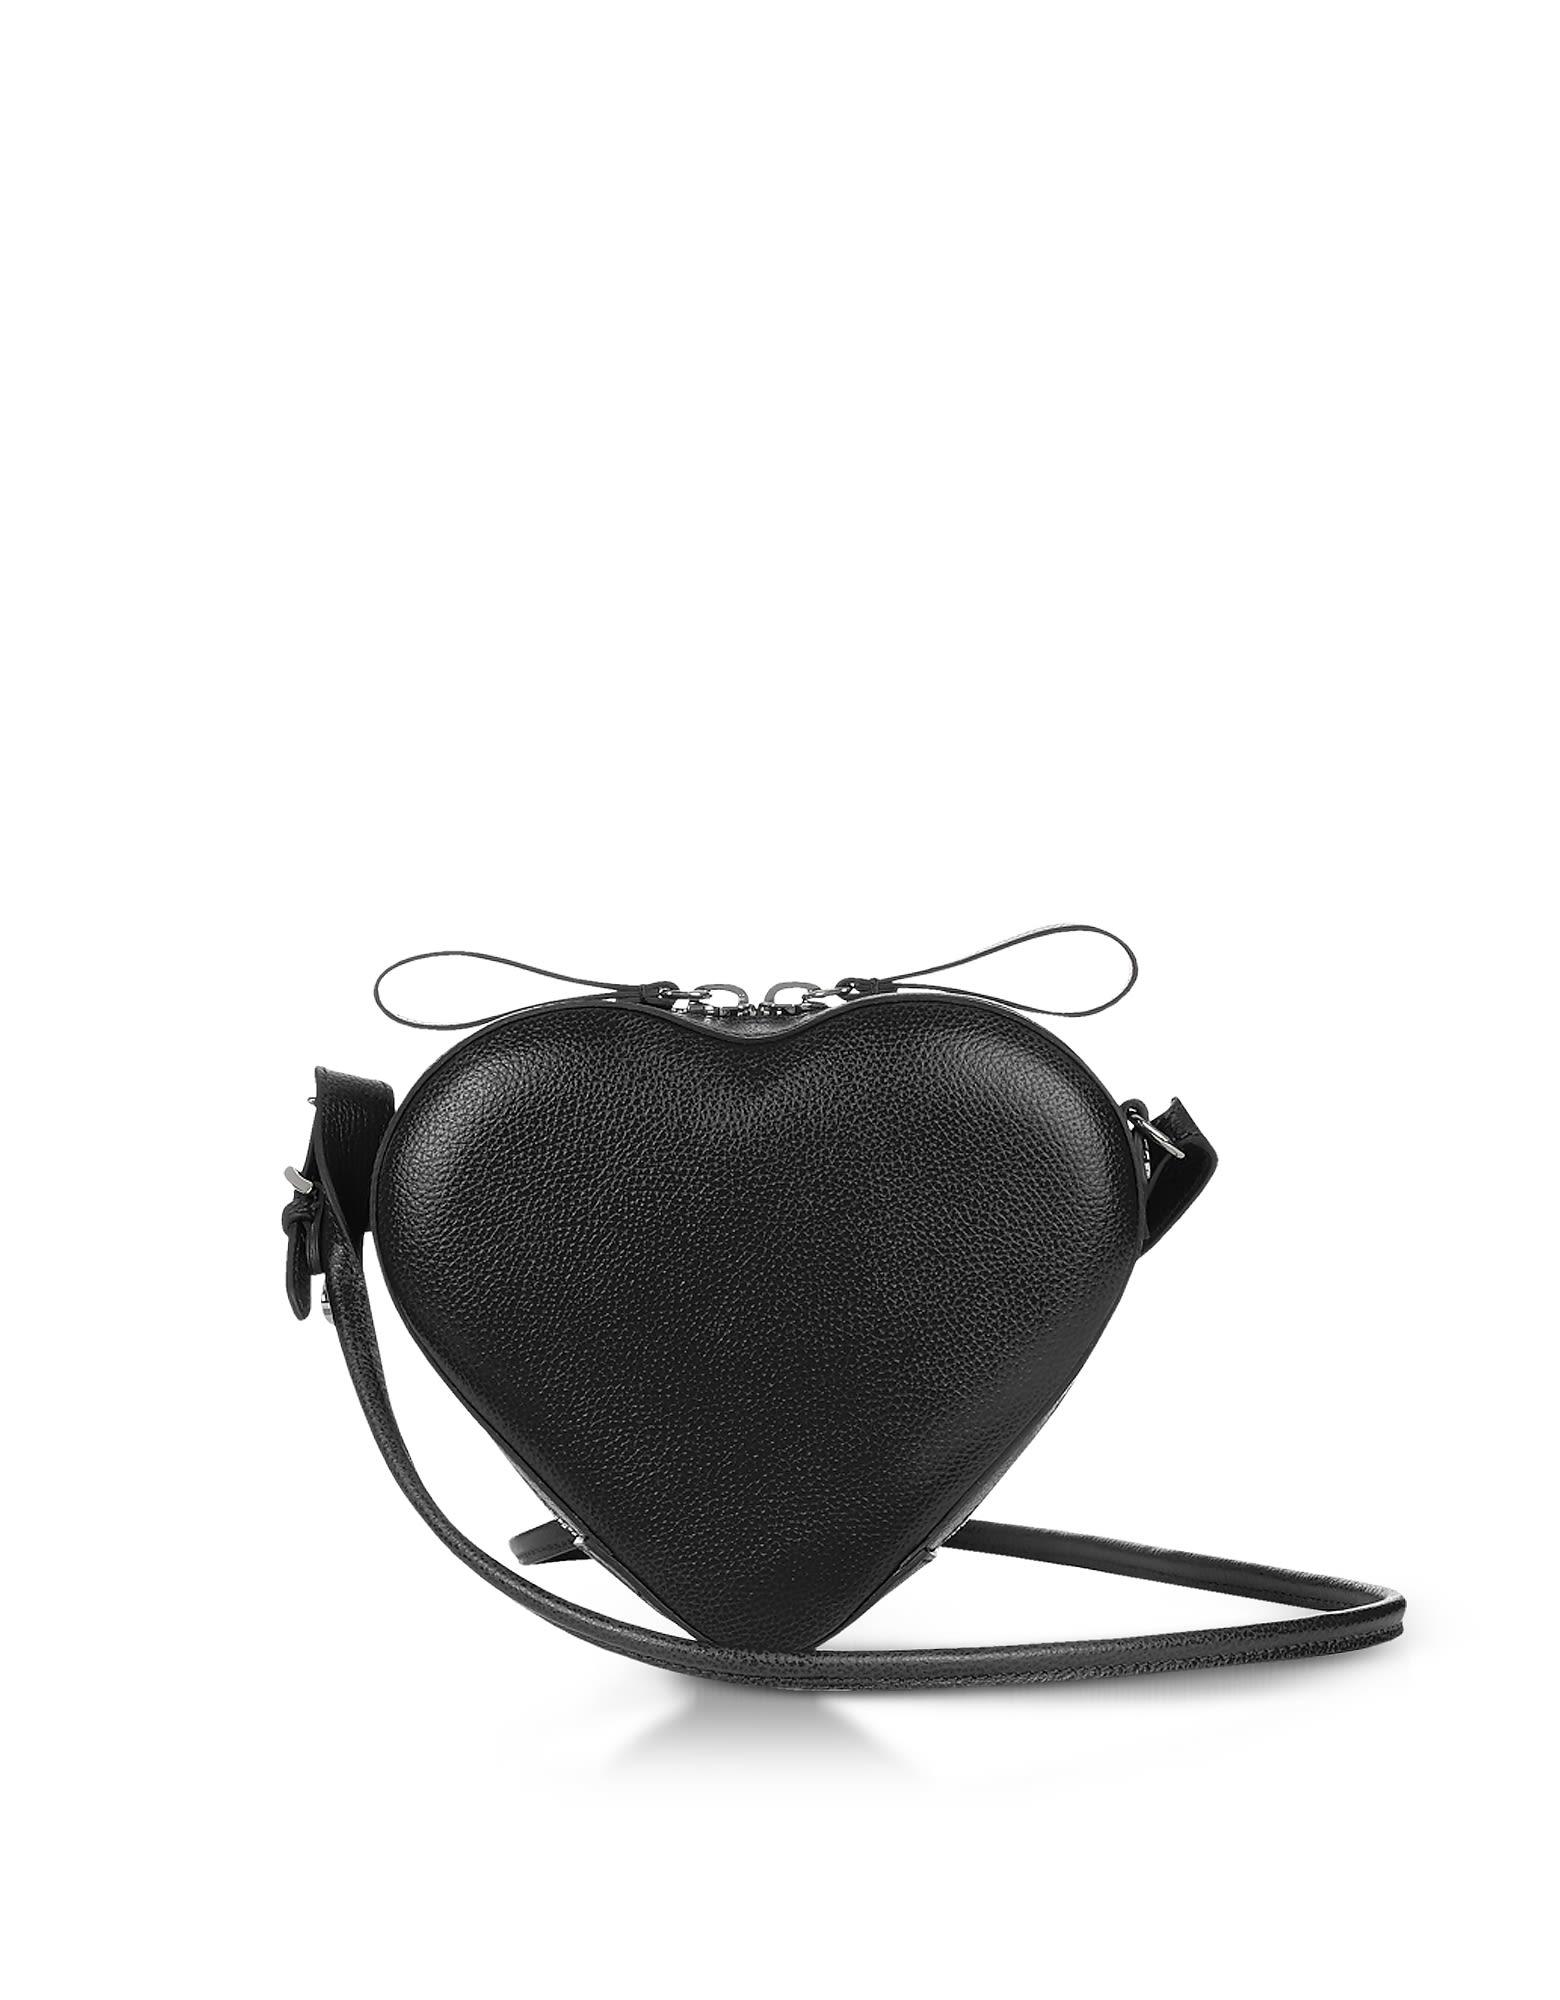 VIVIENNE WESTWOOD JOHANNA BLACK HEART CROSSBODY BAG  3bc810e7fd33d